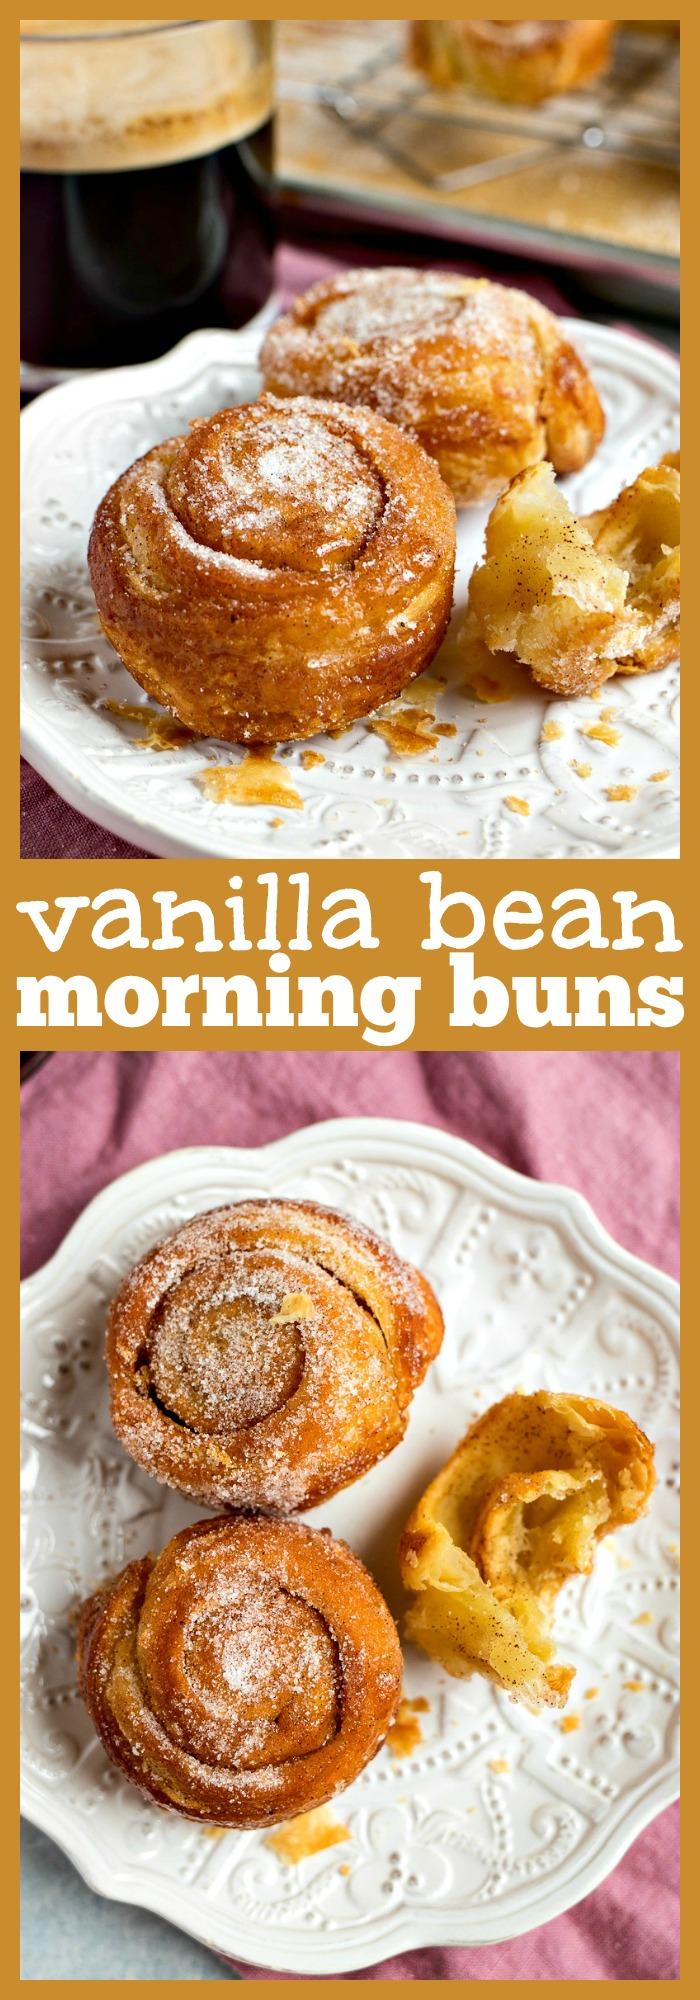 Vanilla Bean Morning Buns photo collage